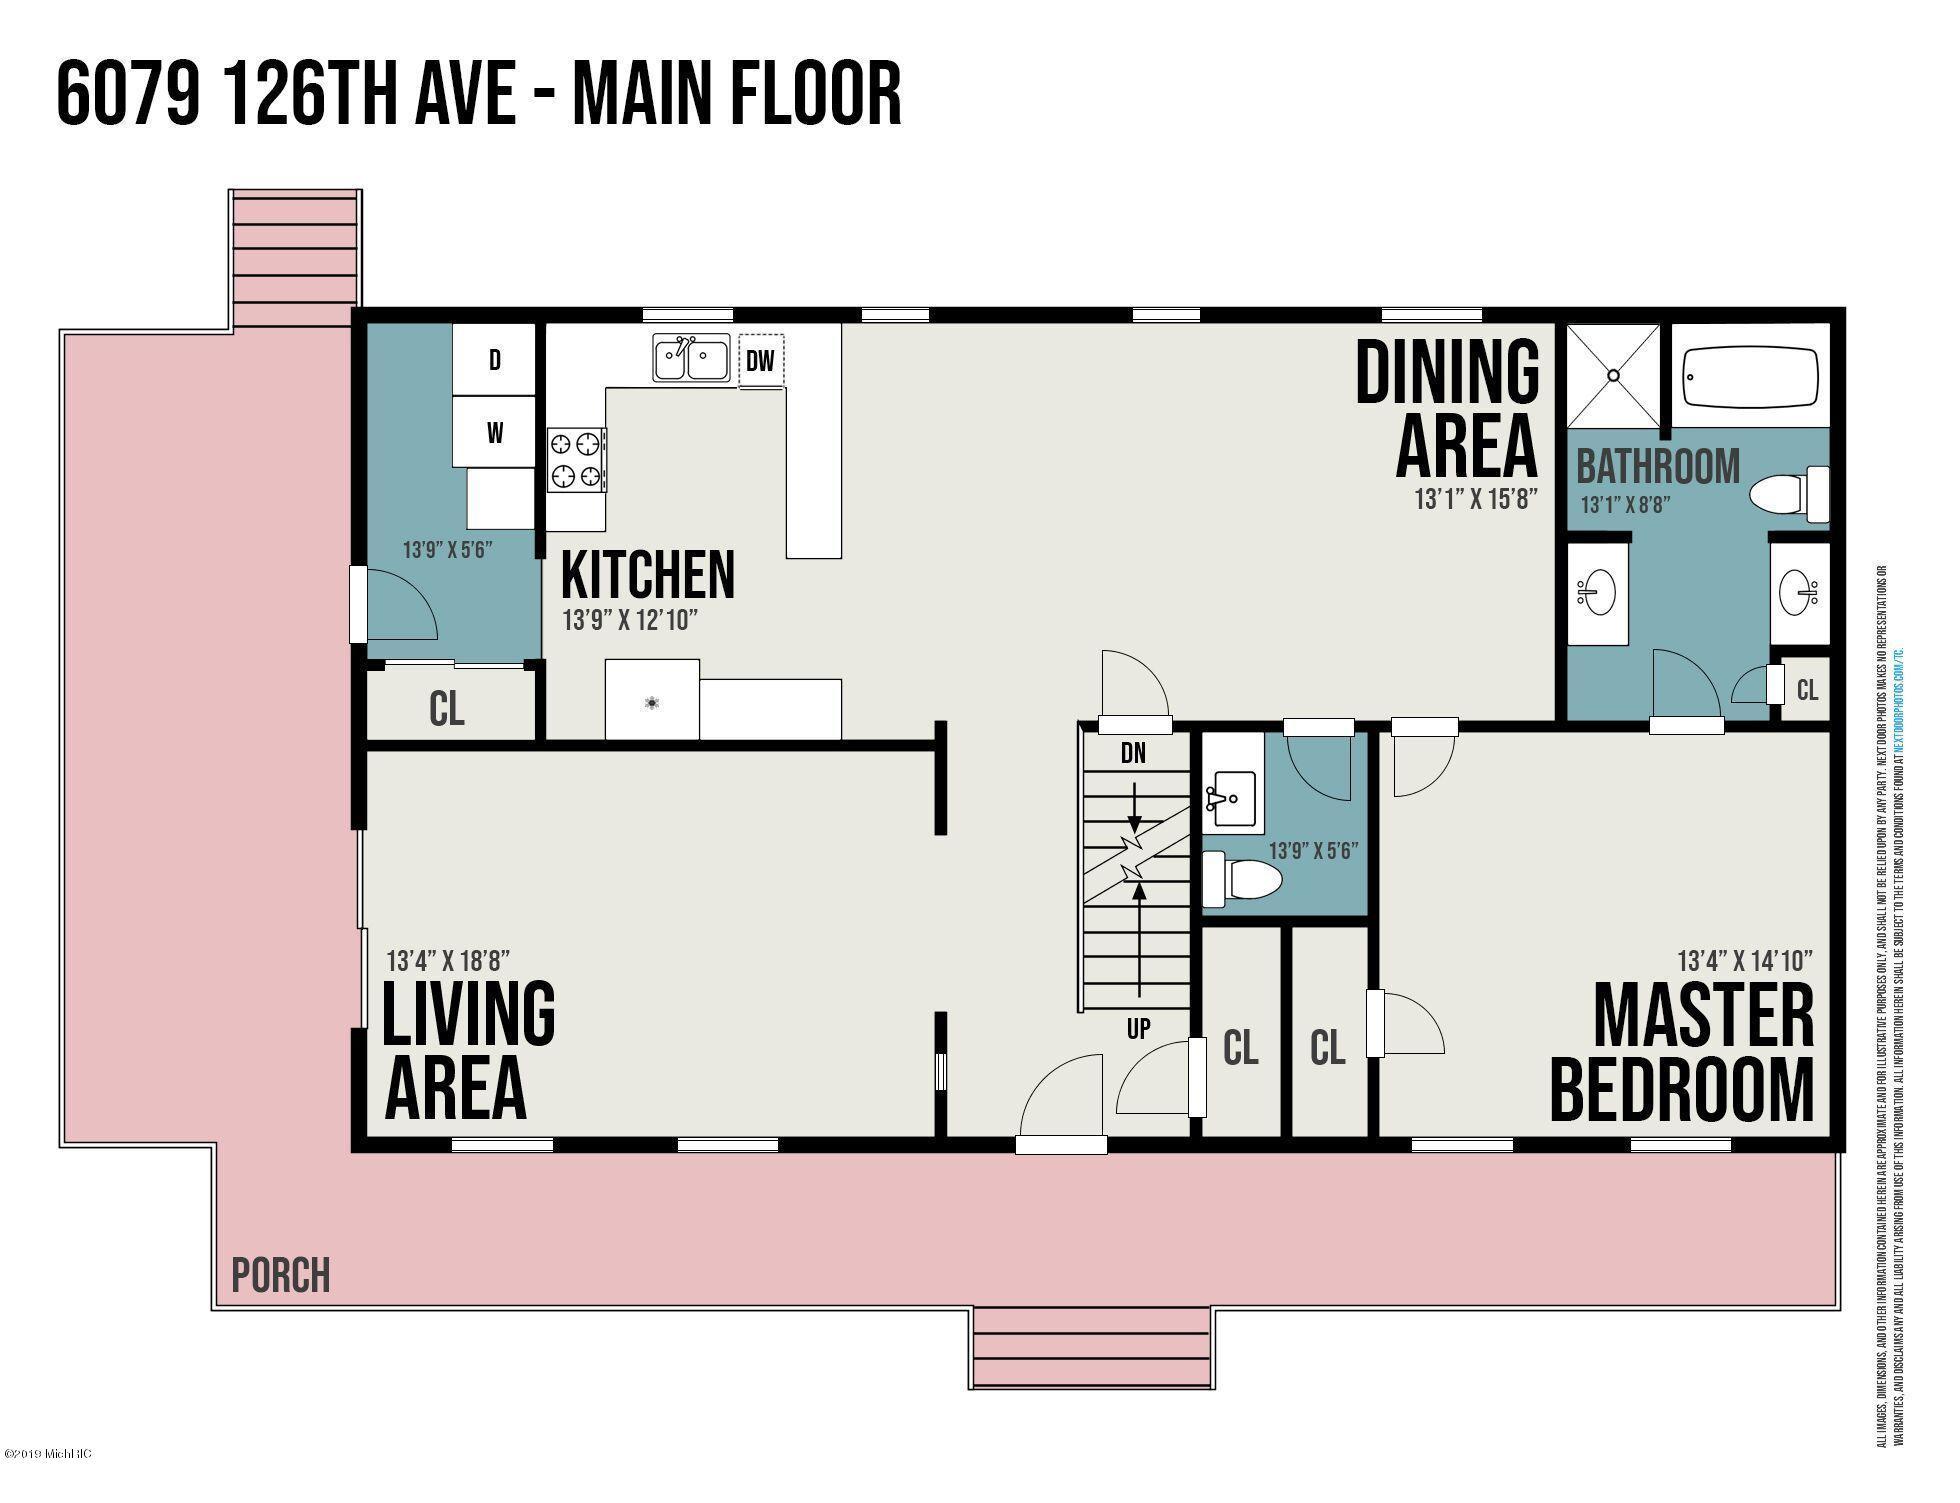 6079 126th Ave Floor Plan House Main Lev